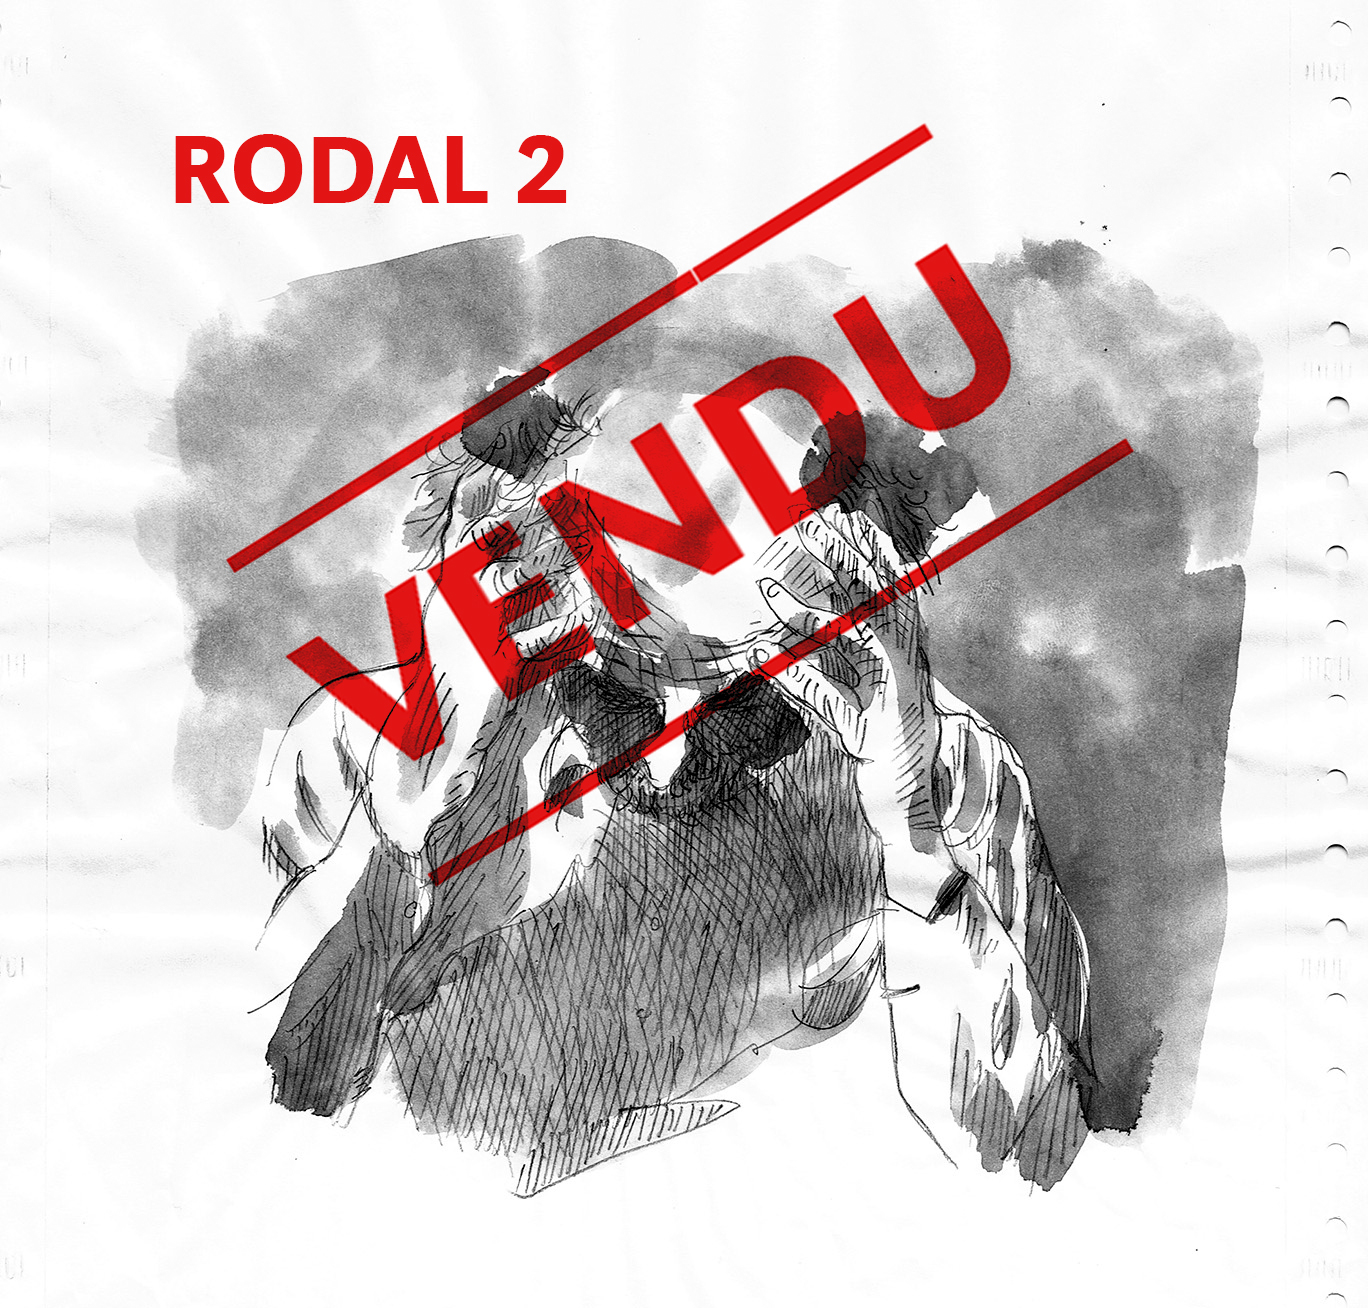 rodal_2